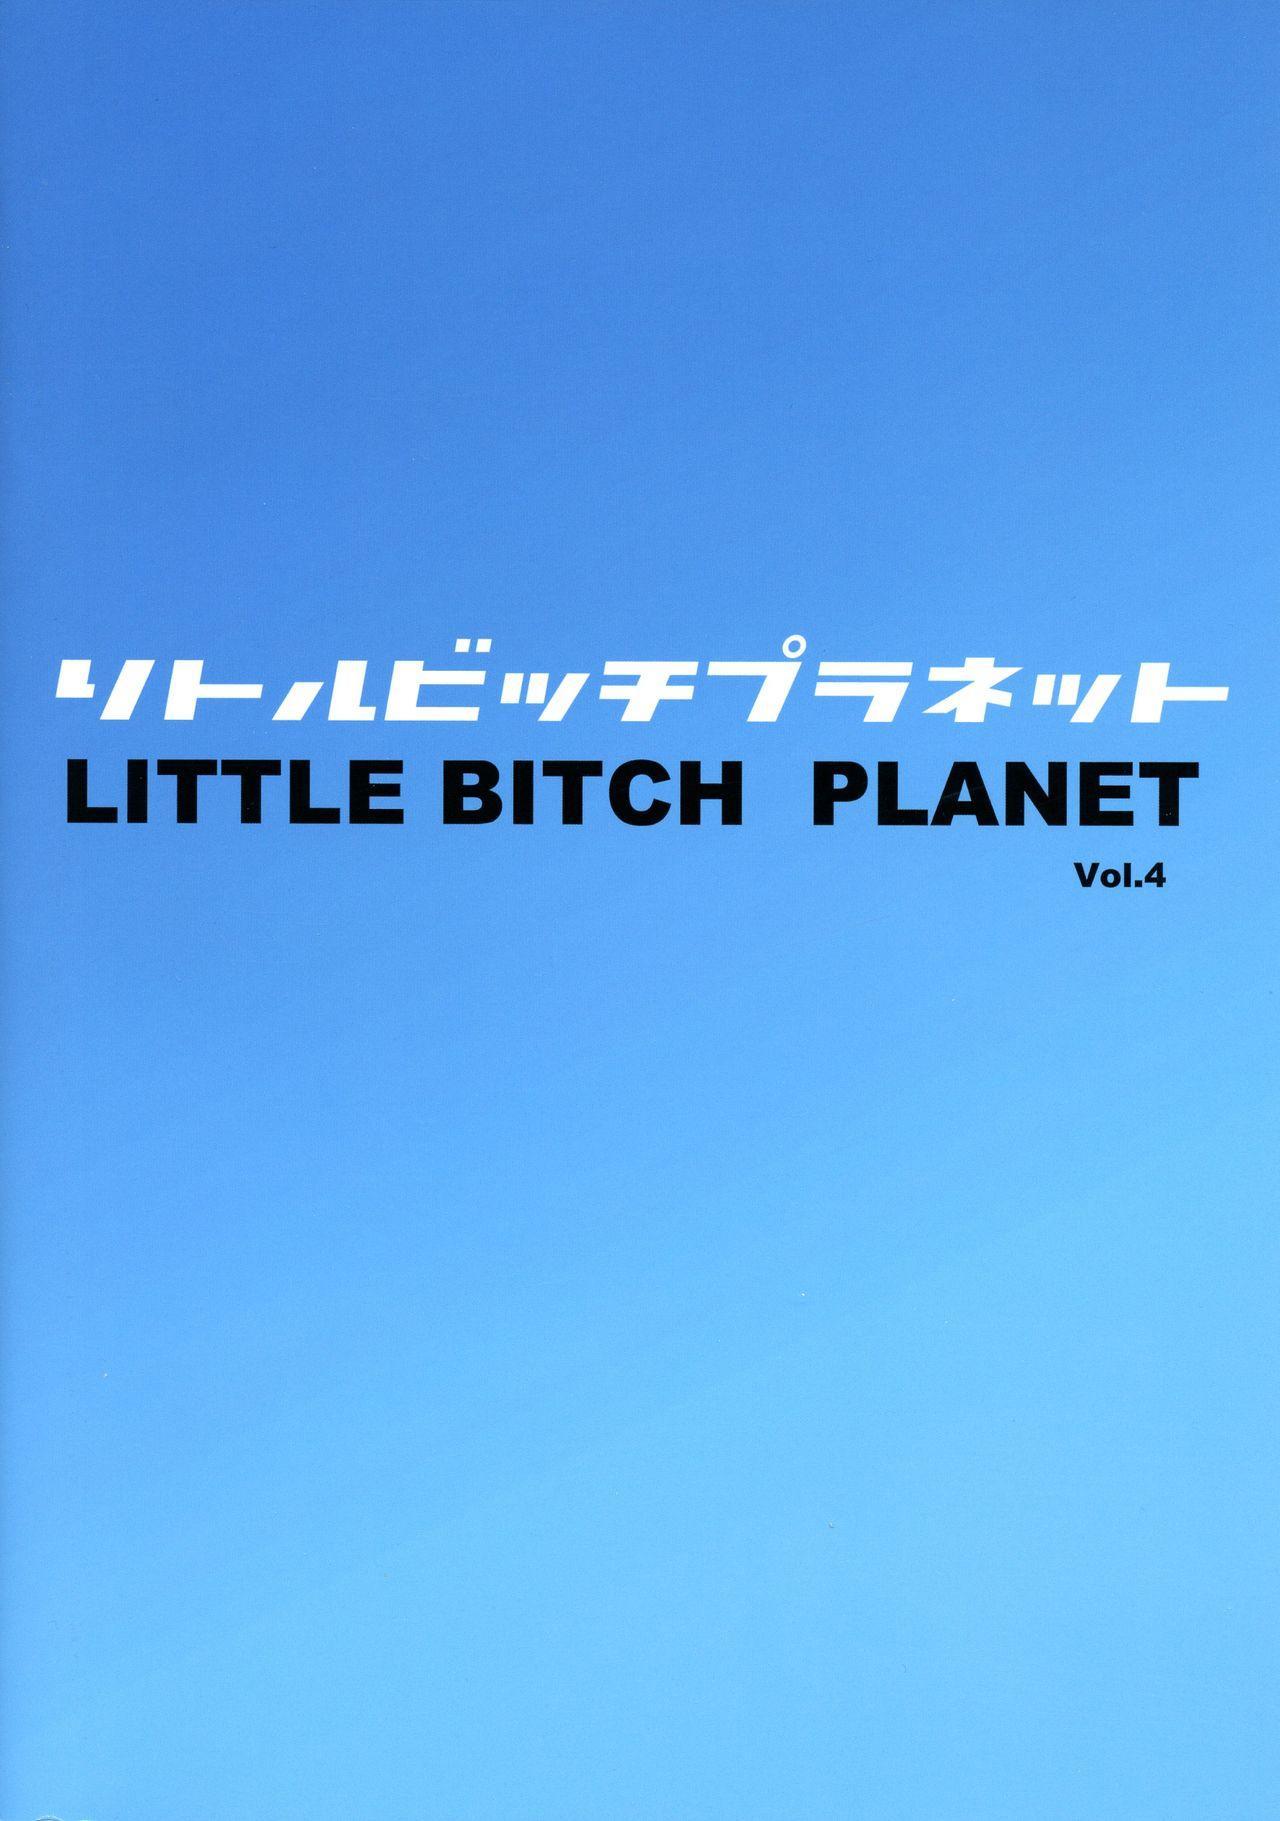 Little Bitch Planet Vol. 4   小小碧池星球 4 1